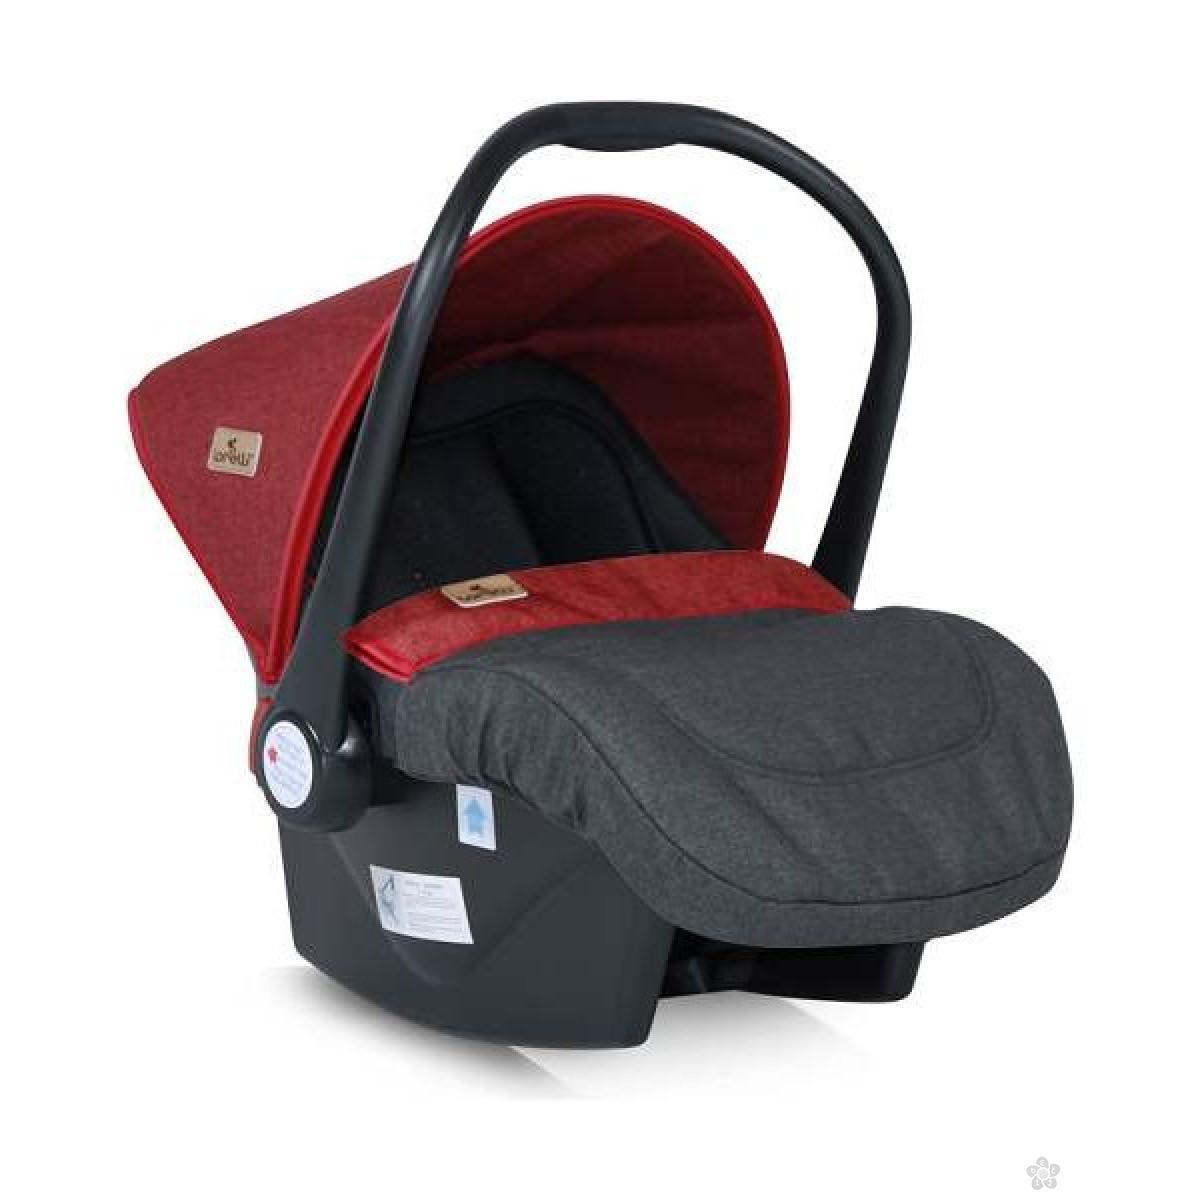 Auto Sedište Lifesaver Black & Red 0-13kg 10070301800